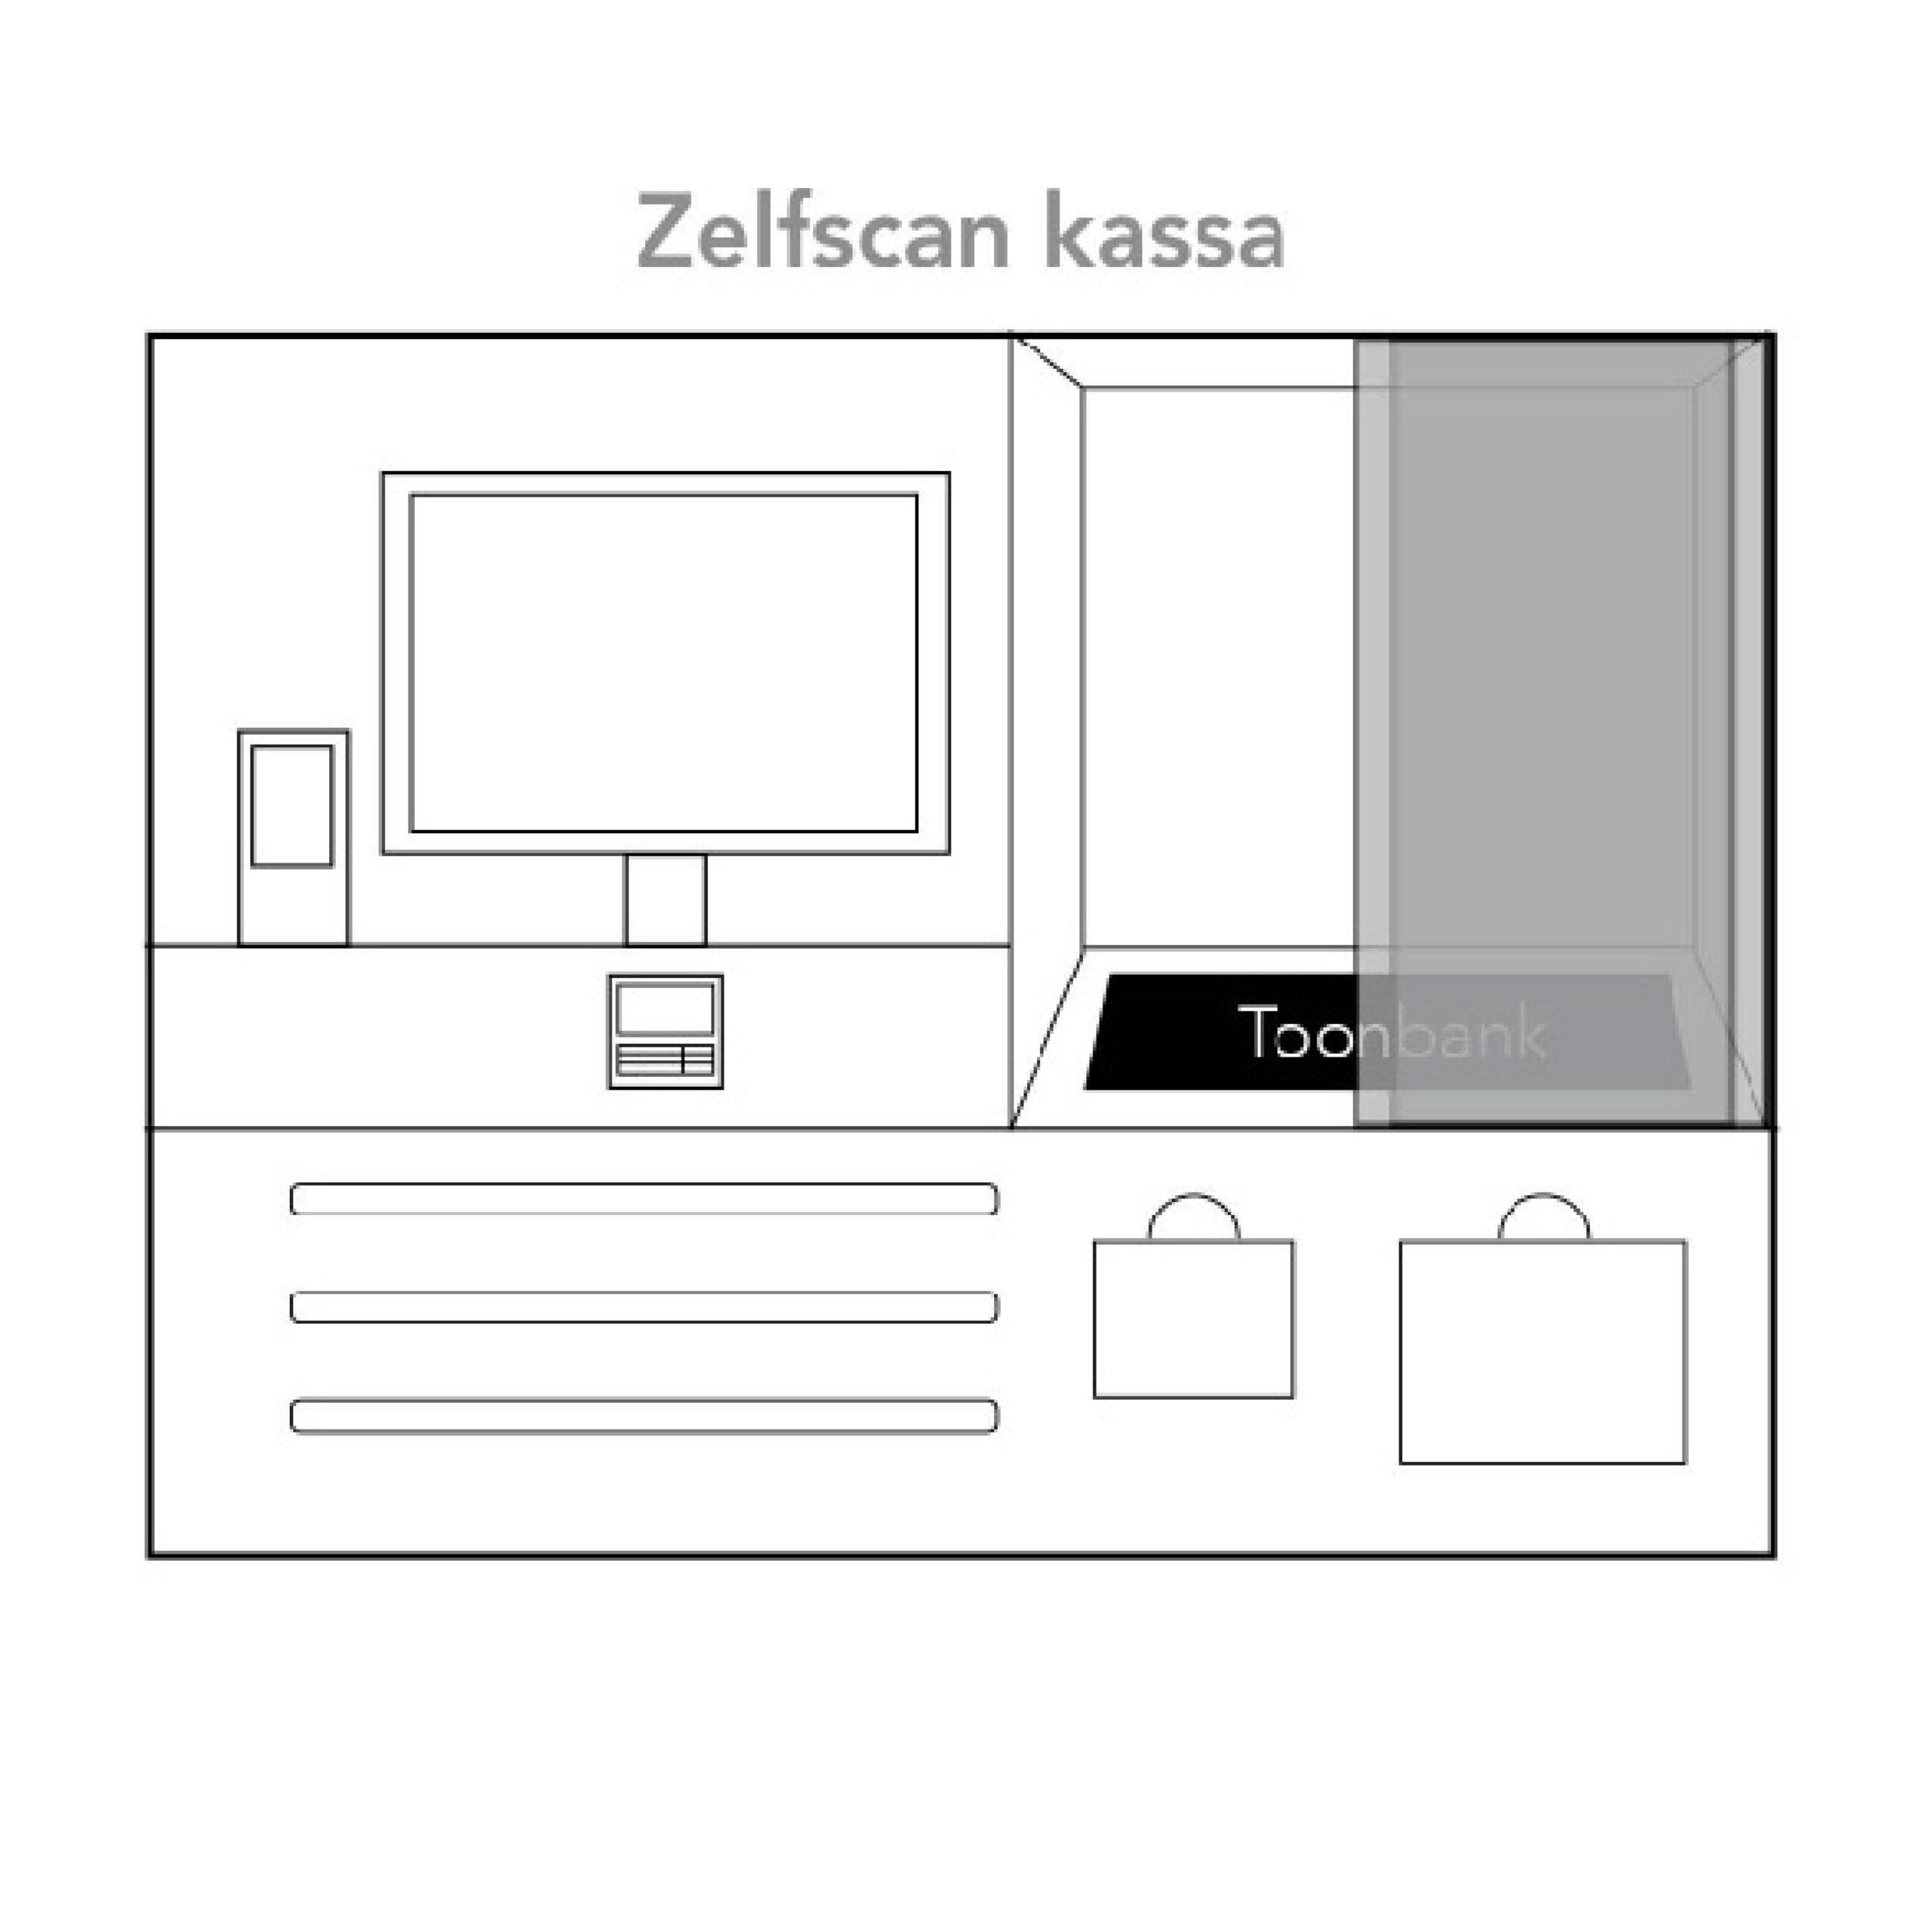 hm prototypes-zelfscan kassa-asiyedesigns